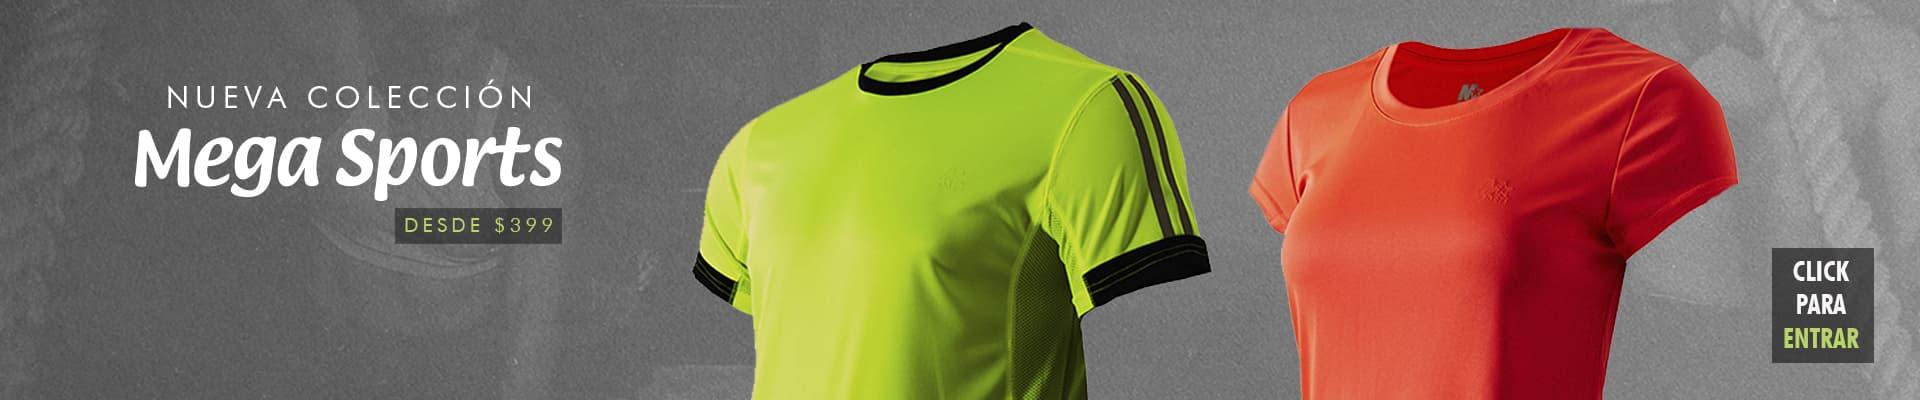 Mega Sports - Calzado 7cb4698408a80